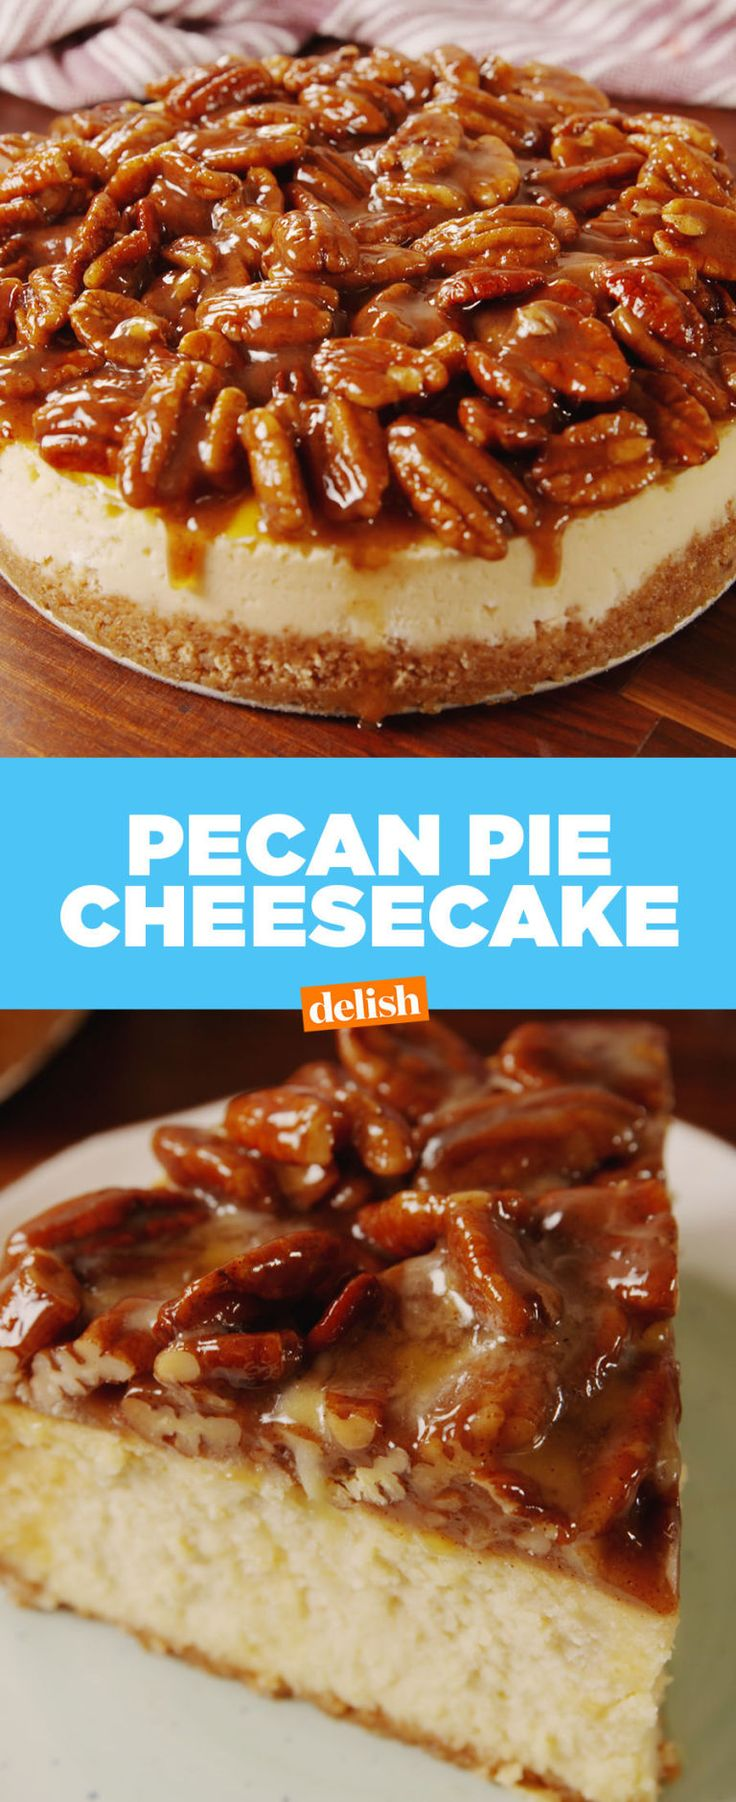 Pecan Pie Cheesecake Is The Sexy Cousin Of Pecan Pie  - Delish.com